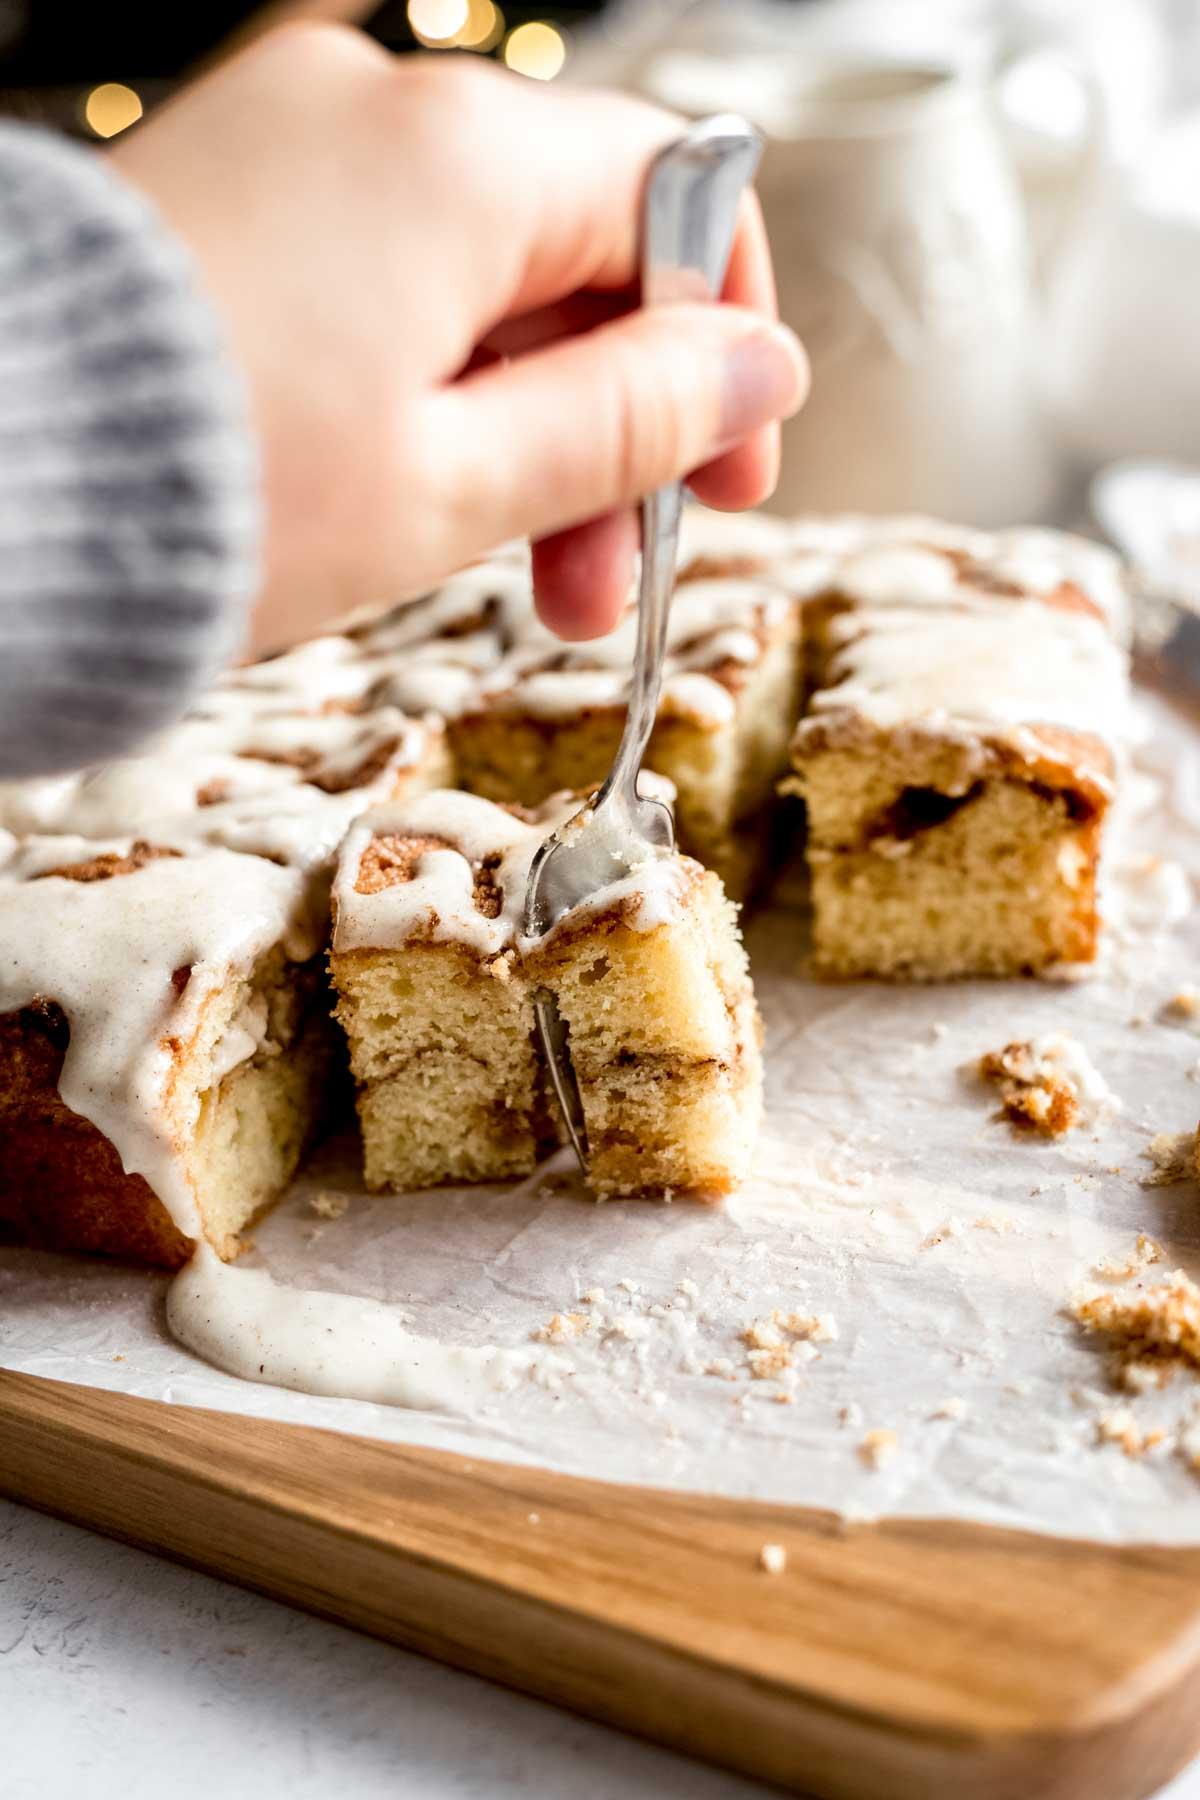 Biting into the cake - cream cheese glaze